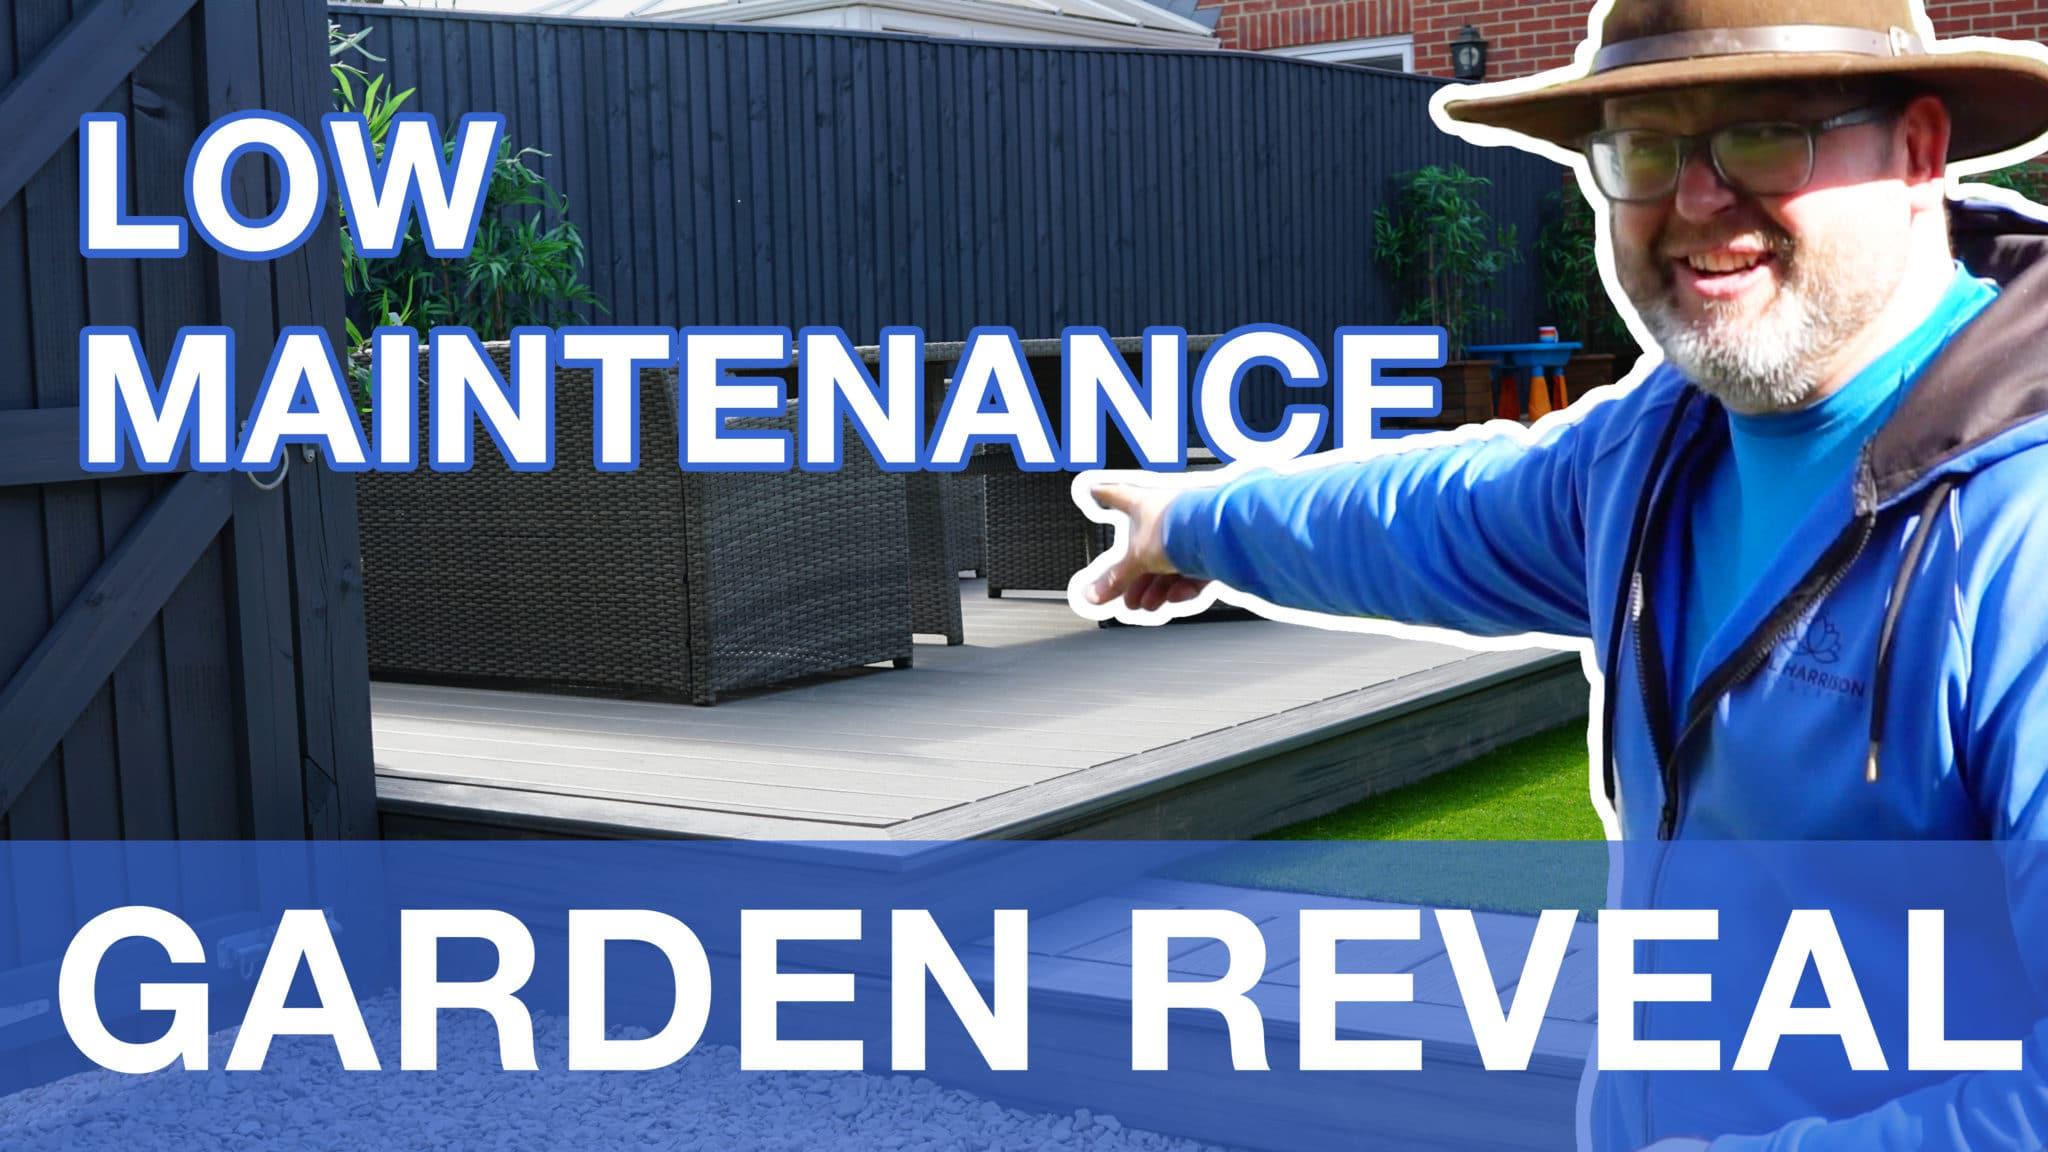 Low maintenance garden reveal